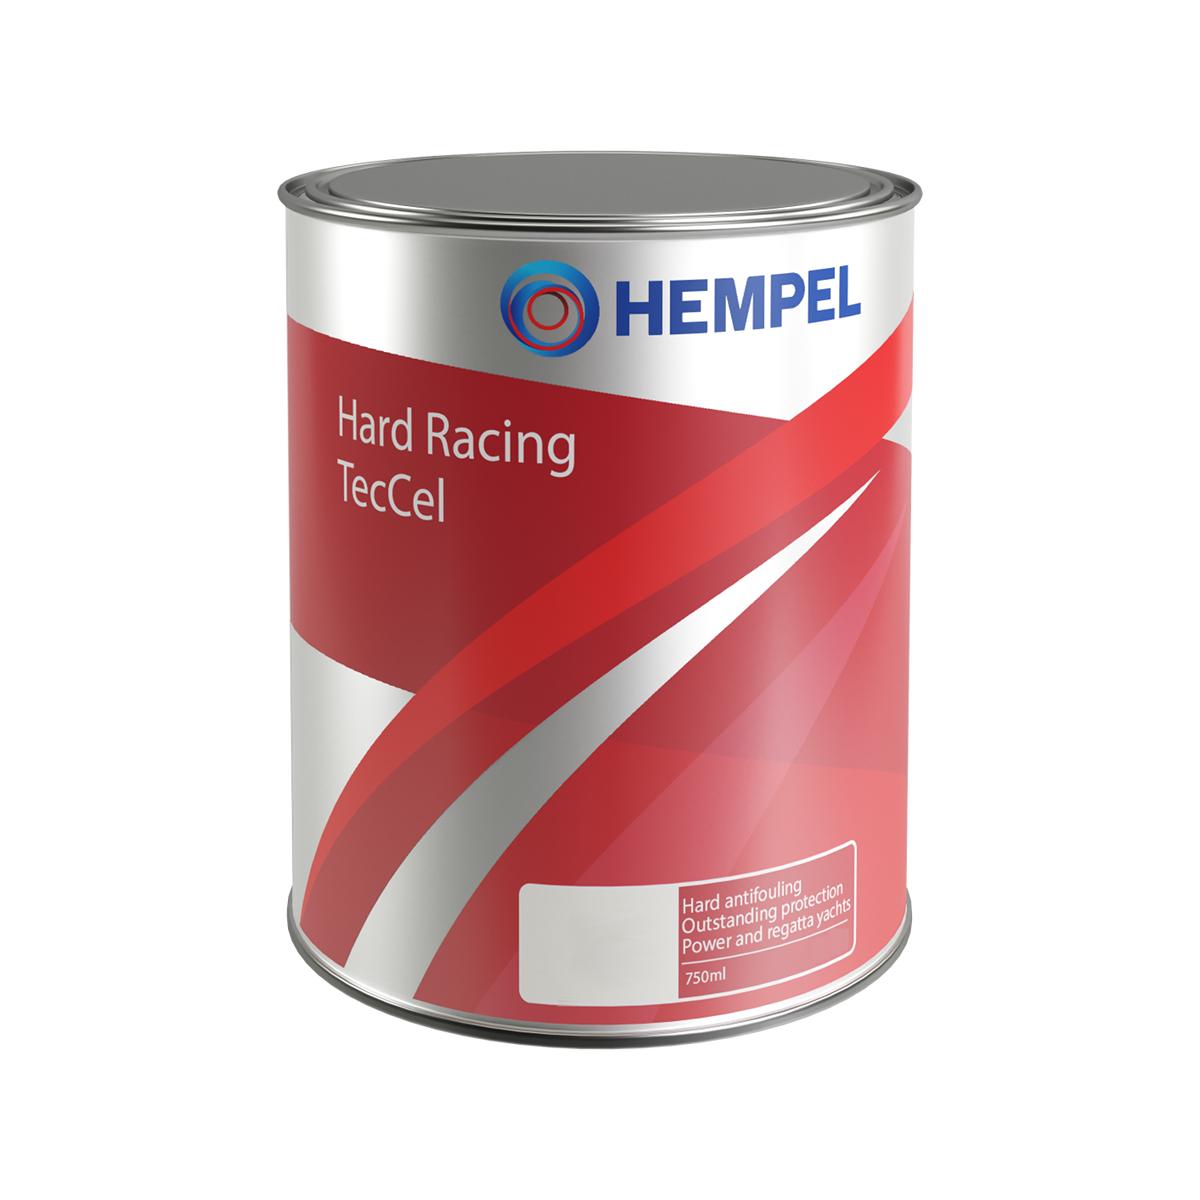 Hempel Hard Racing TecCel Antifouling Antifouling Antifouling Hartantifouling 750ml 7d75a8